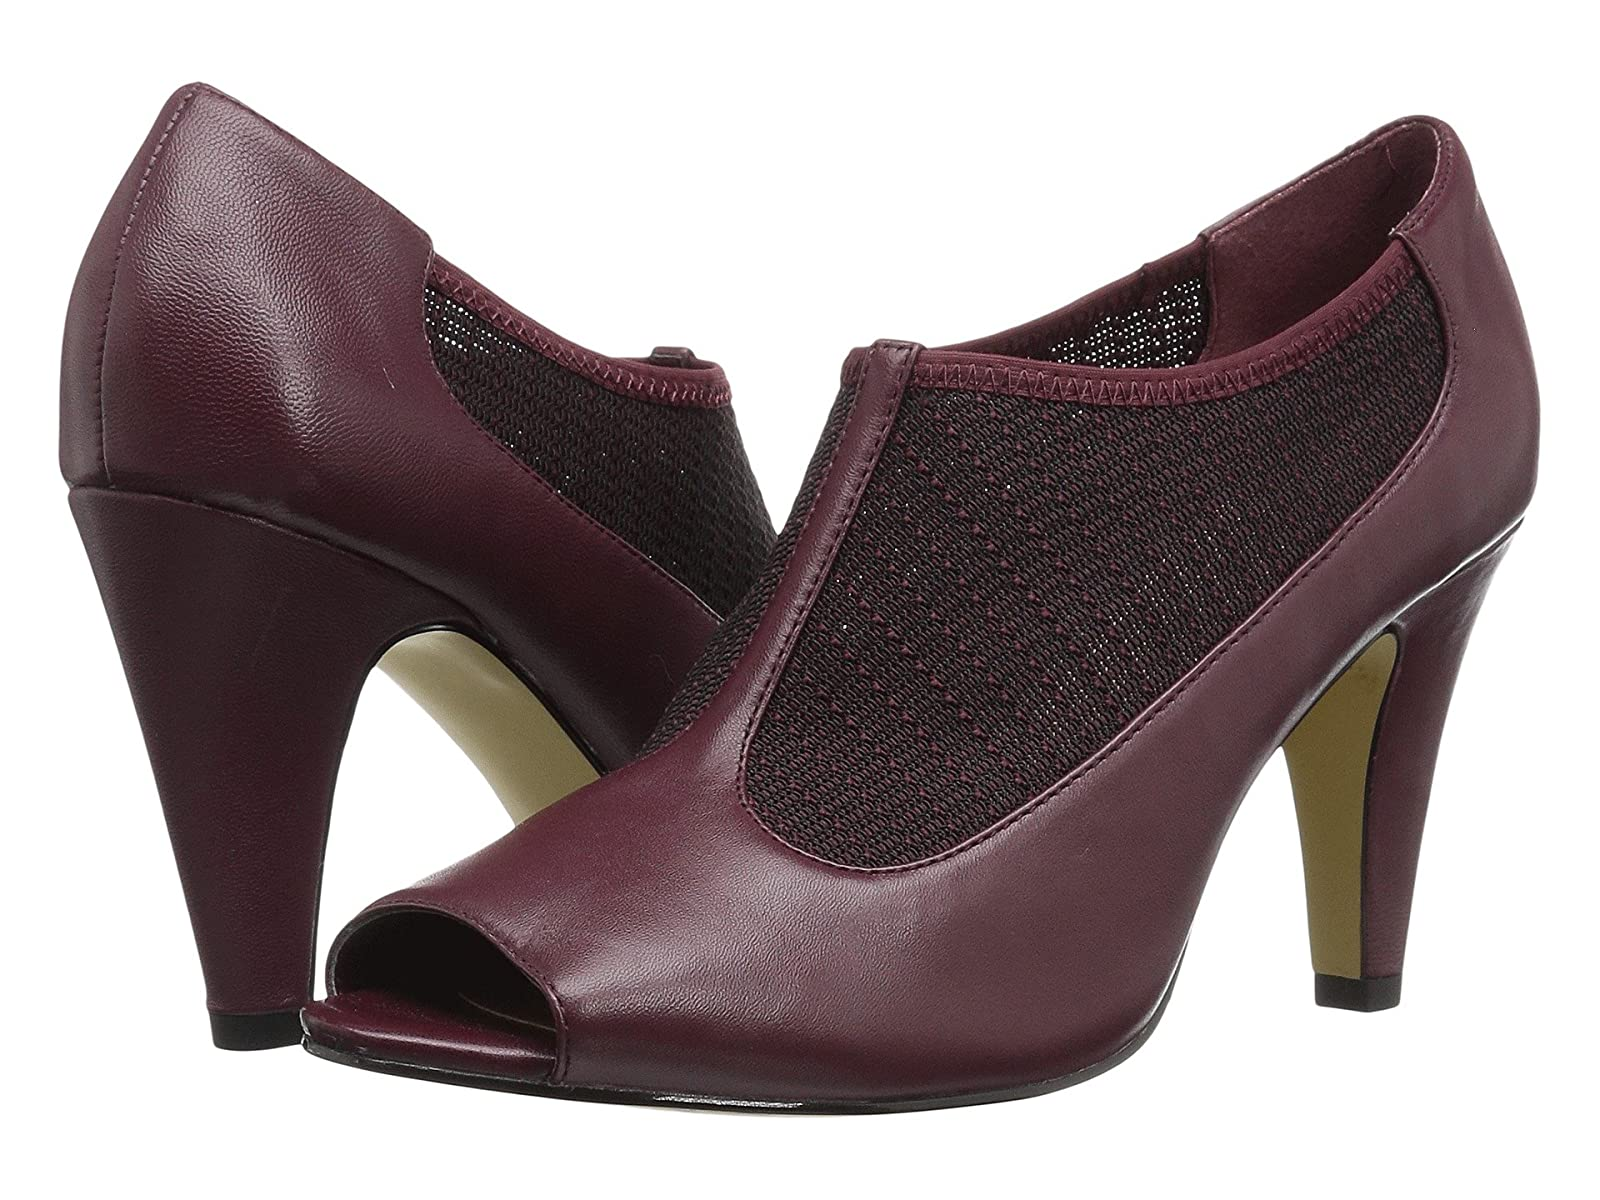 Bella-Vita NinetteCheap and distinctive eye-catching shoes